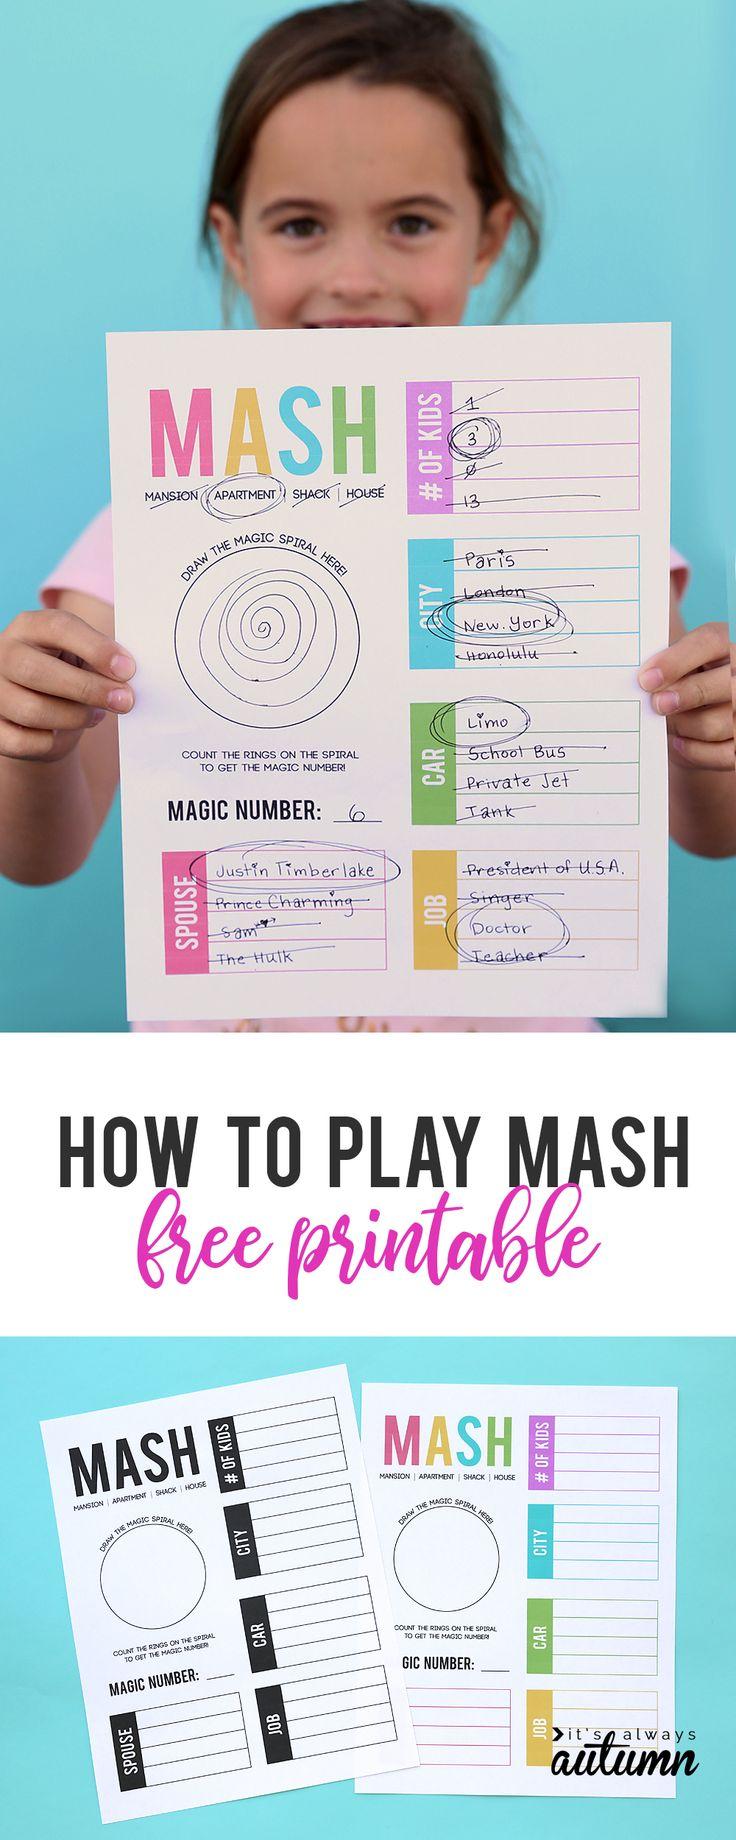 How to play MASH + a free printable game sheet Free